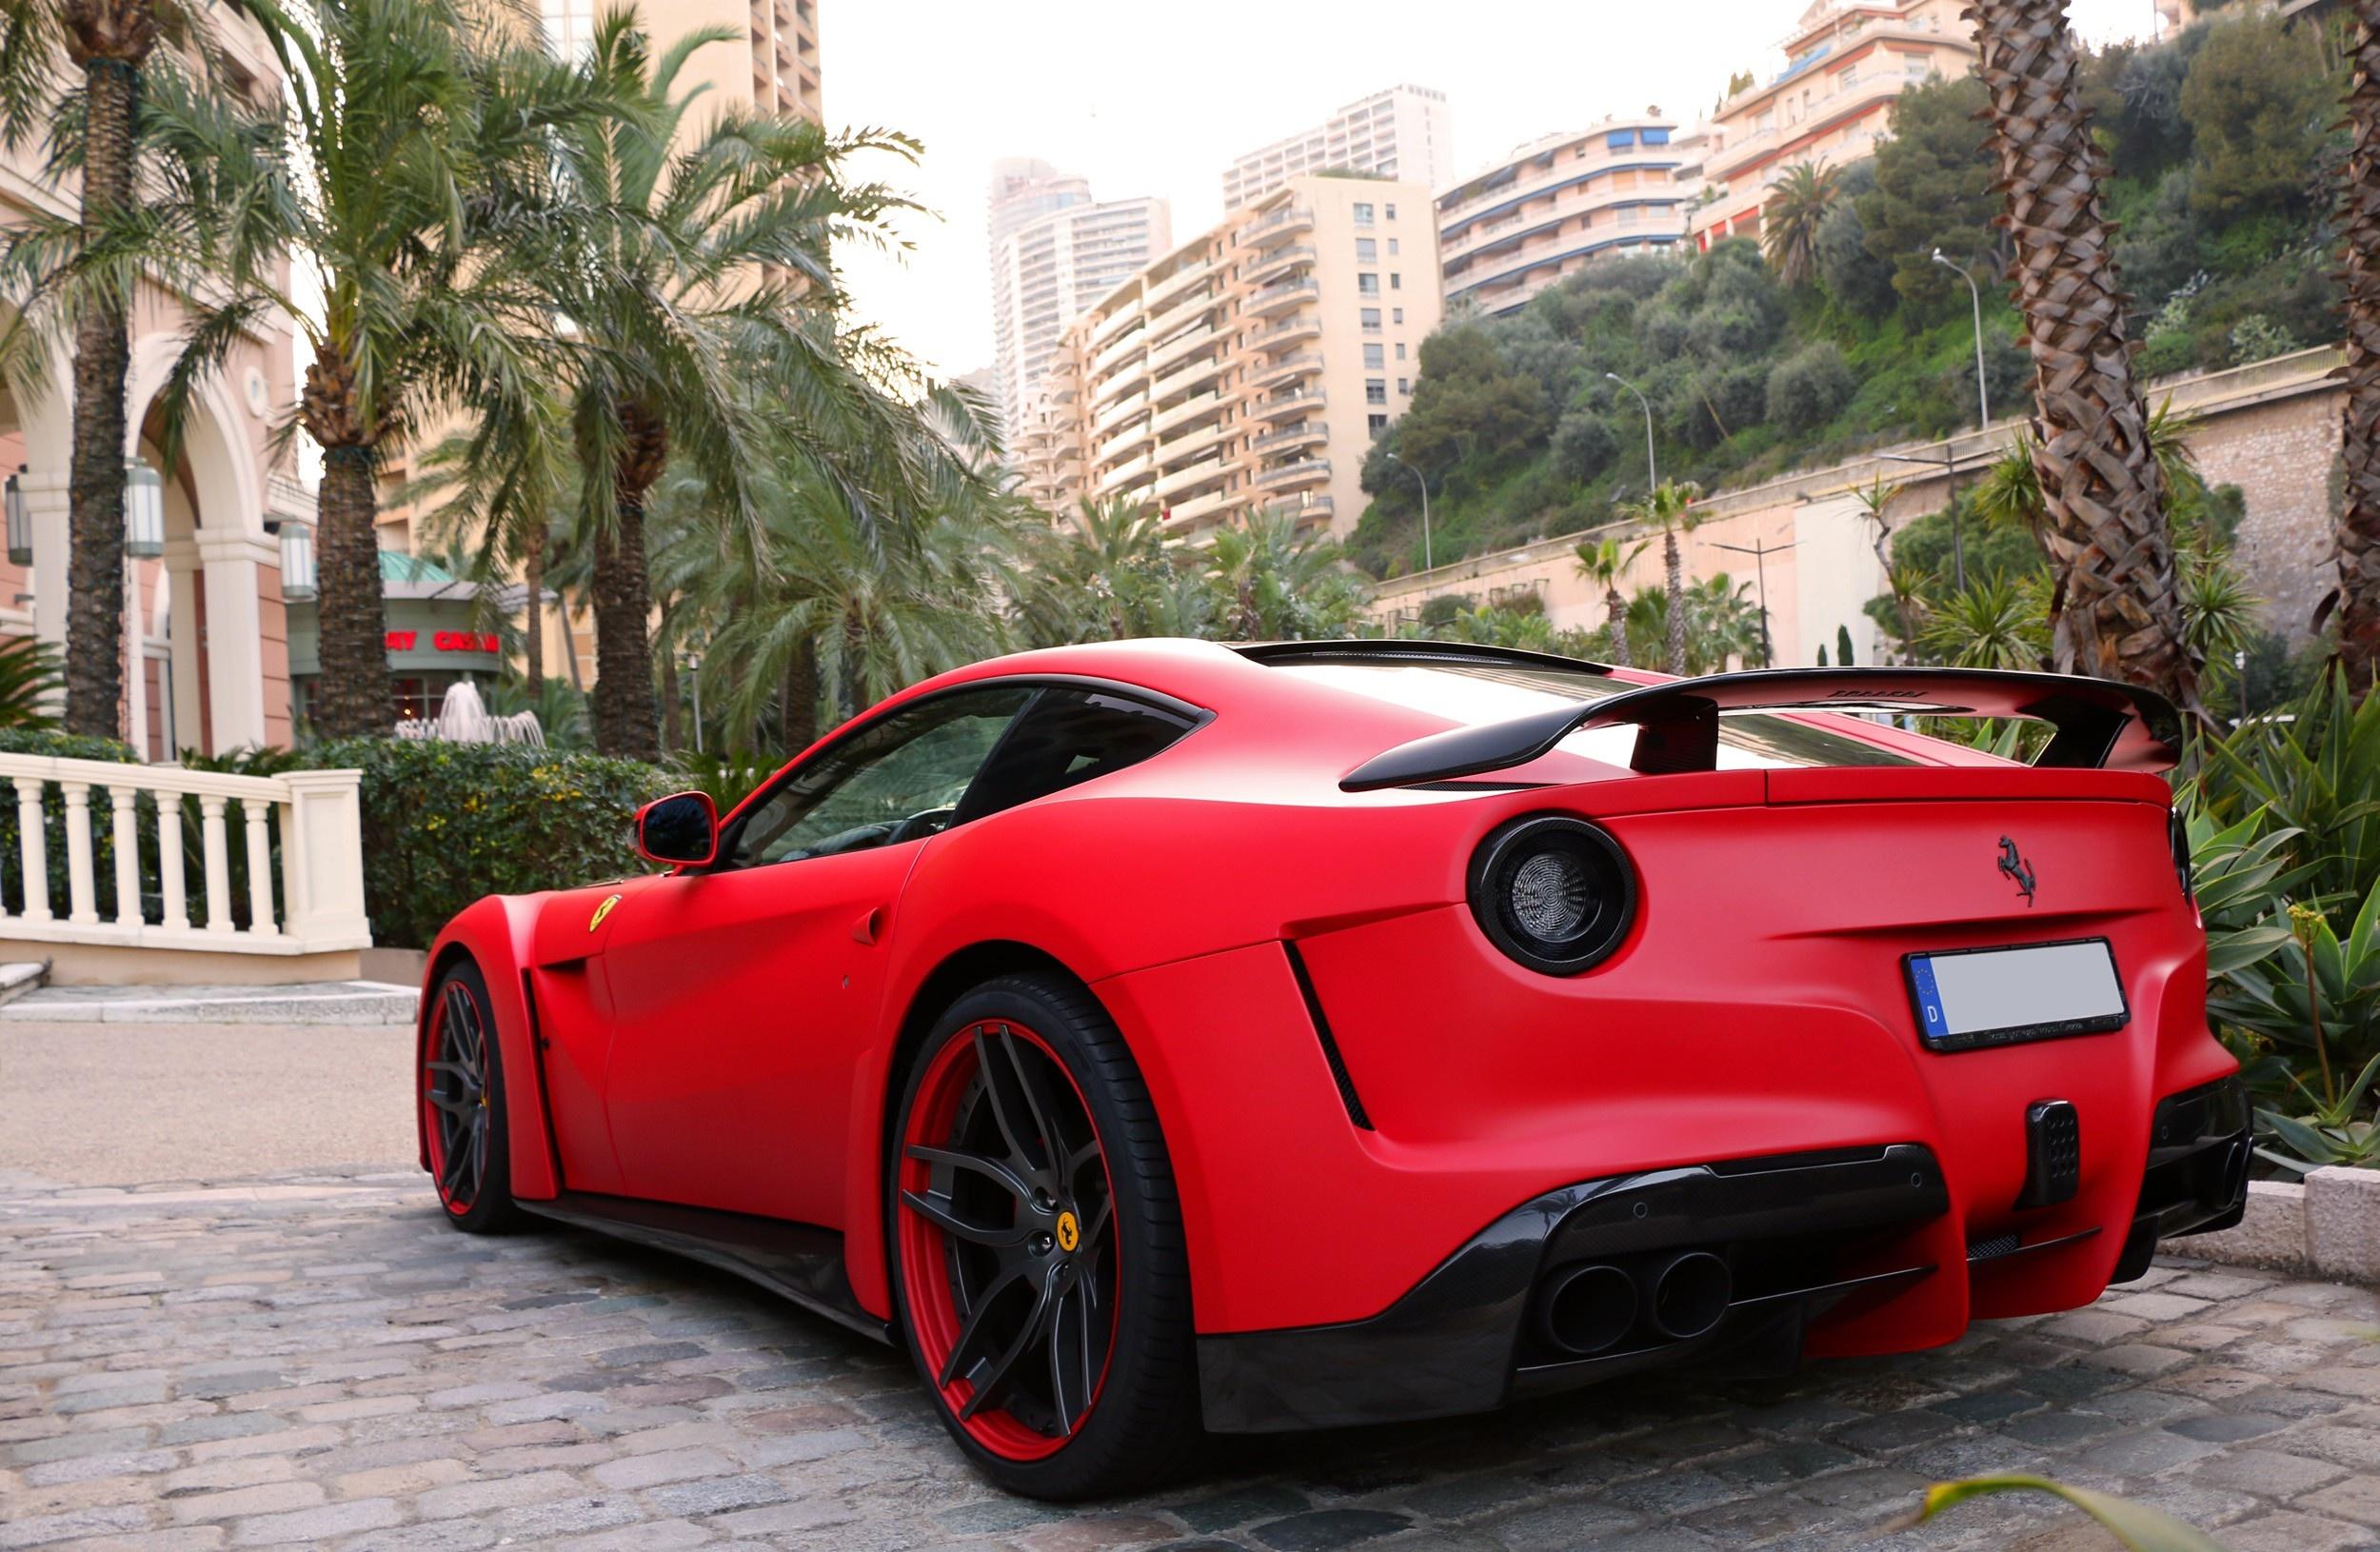 Ferrari F12 Berlinetta Supercar Novitec Rosso N largo   Stock 2500x1630